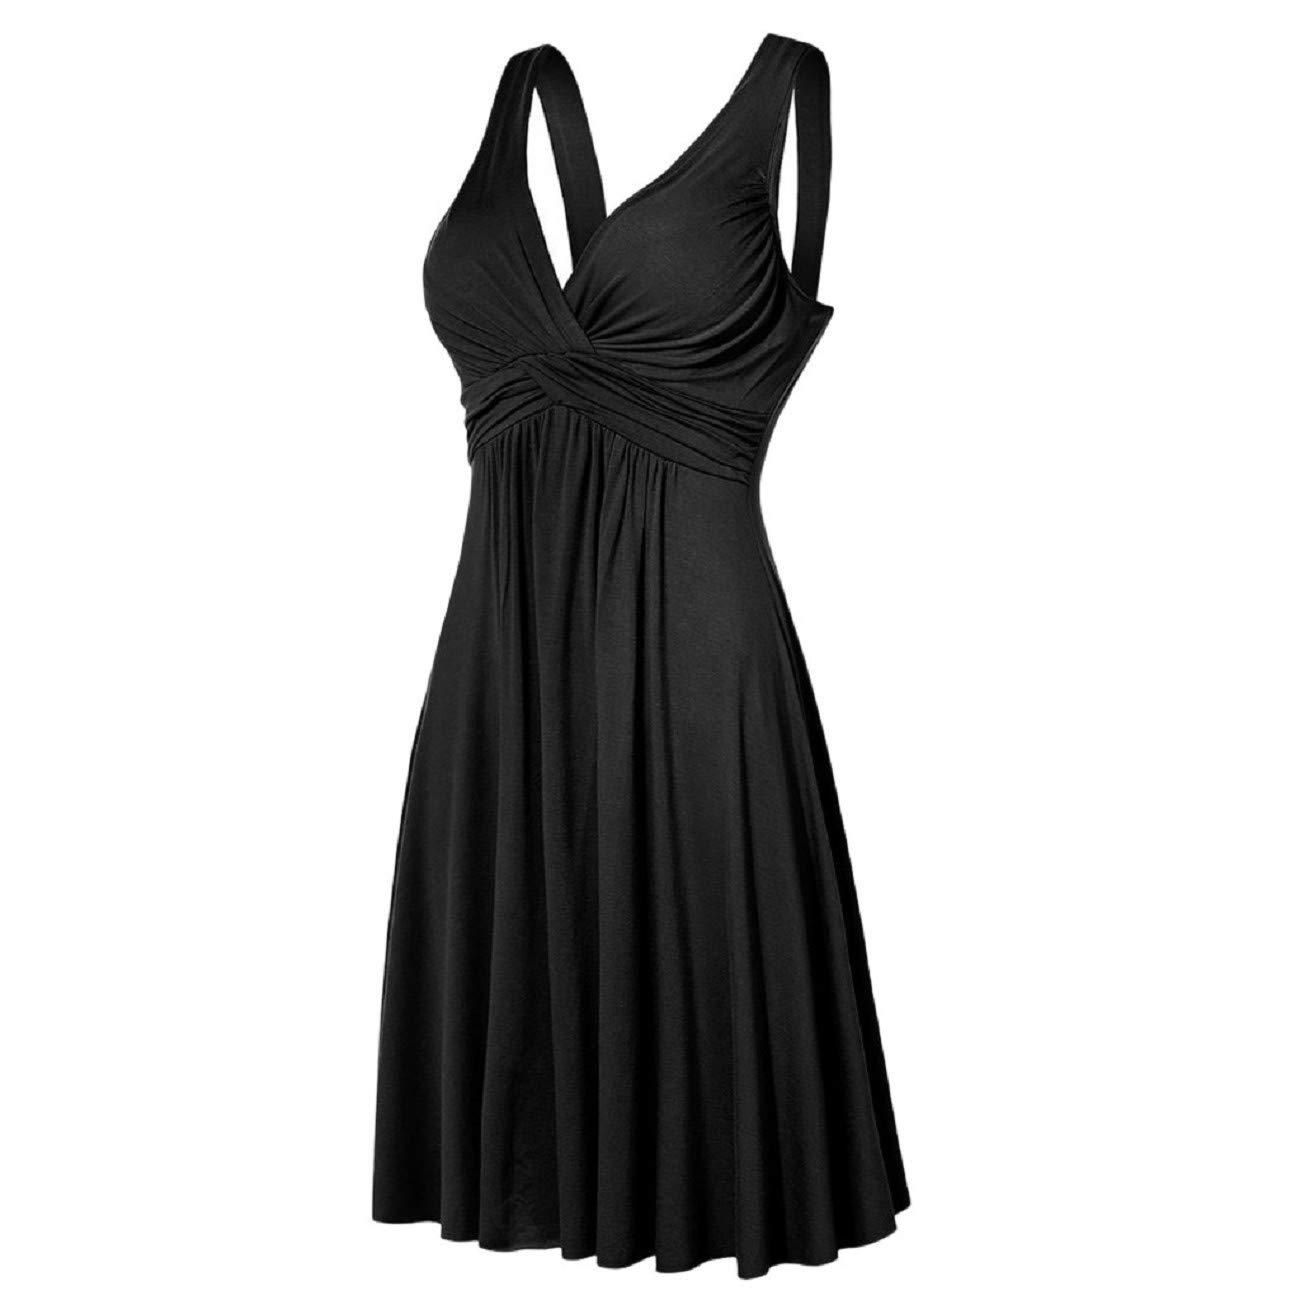 FAPIZI Women Plus Size Dress Vintage V-Neck Sling Leated Slim Flare Skirt Dress Casual Cocktail Skater Mini Short Dress